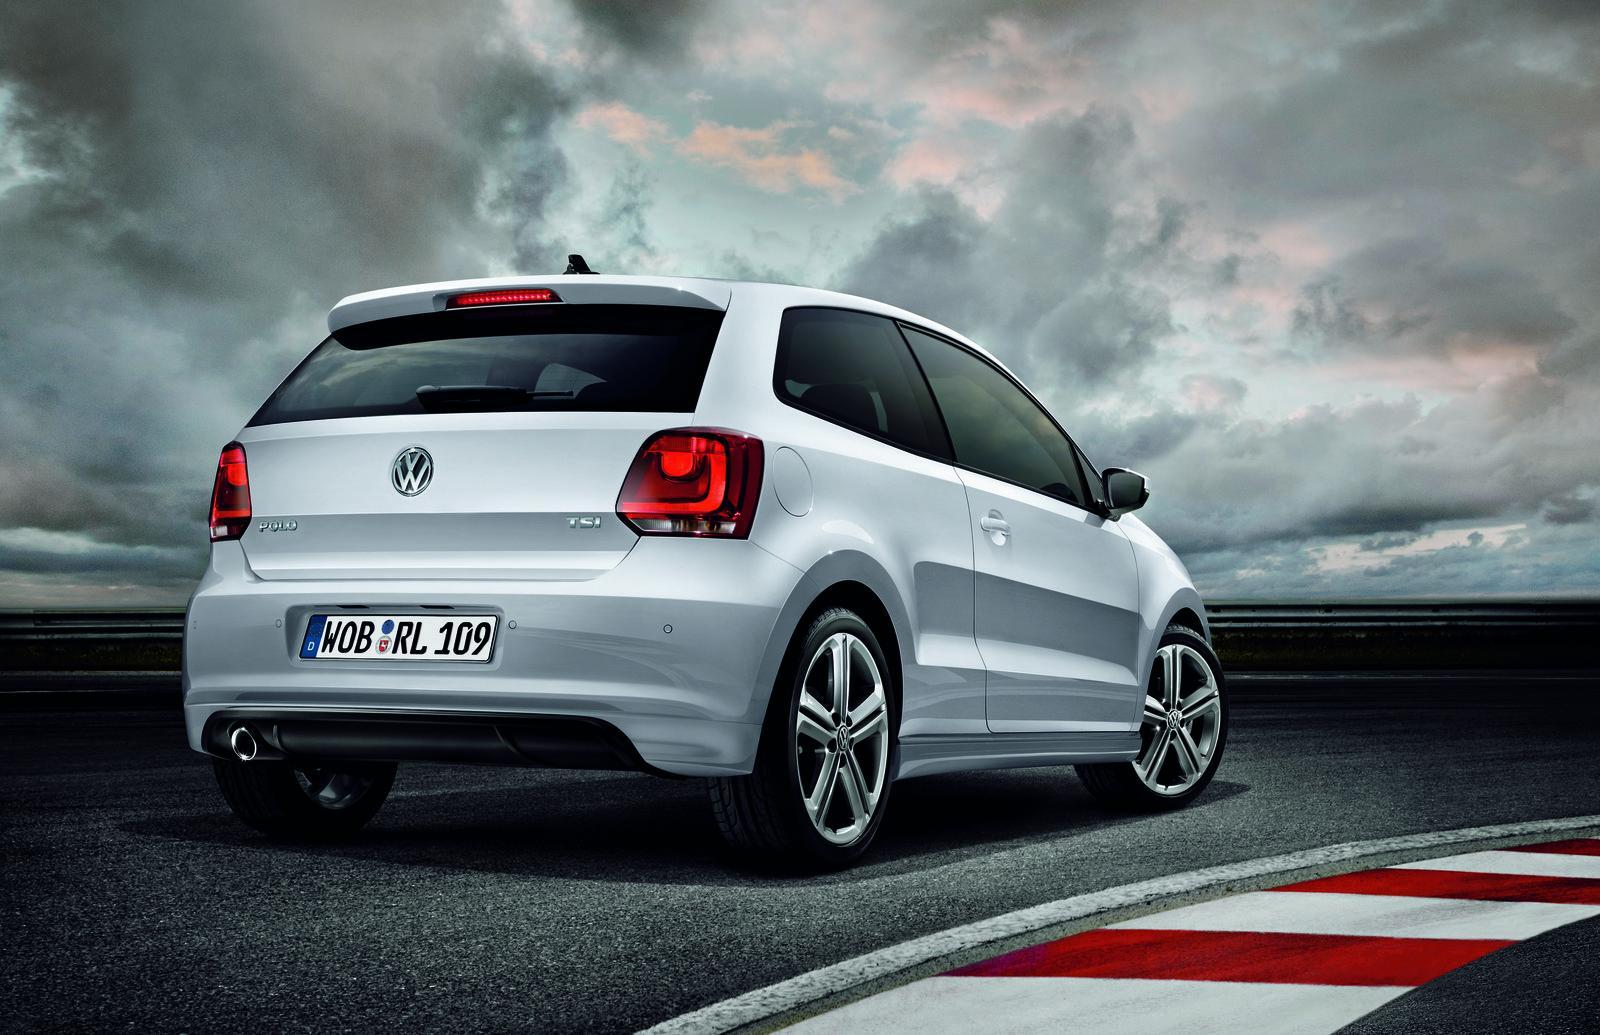 2012 Volkswagen Polo R Line Price 163 15 815